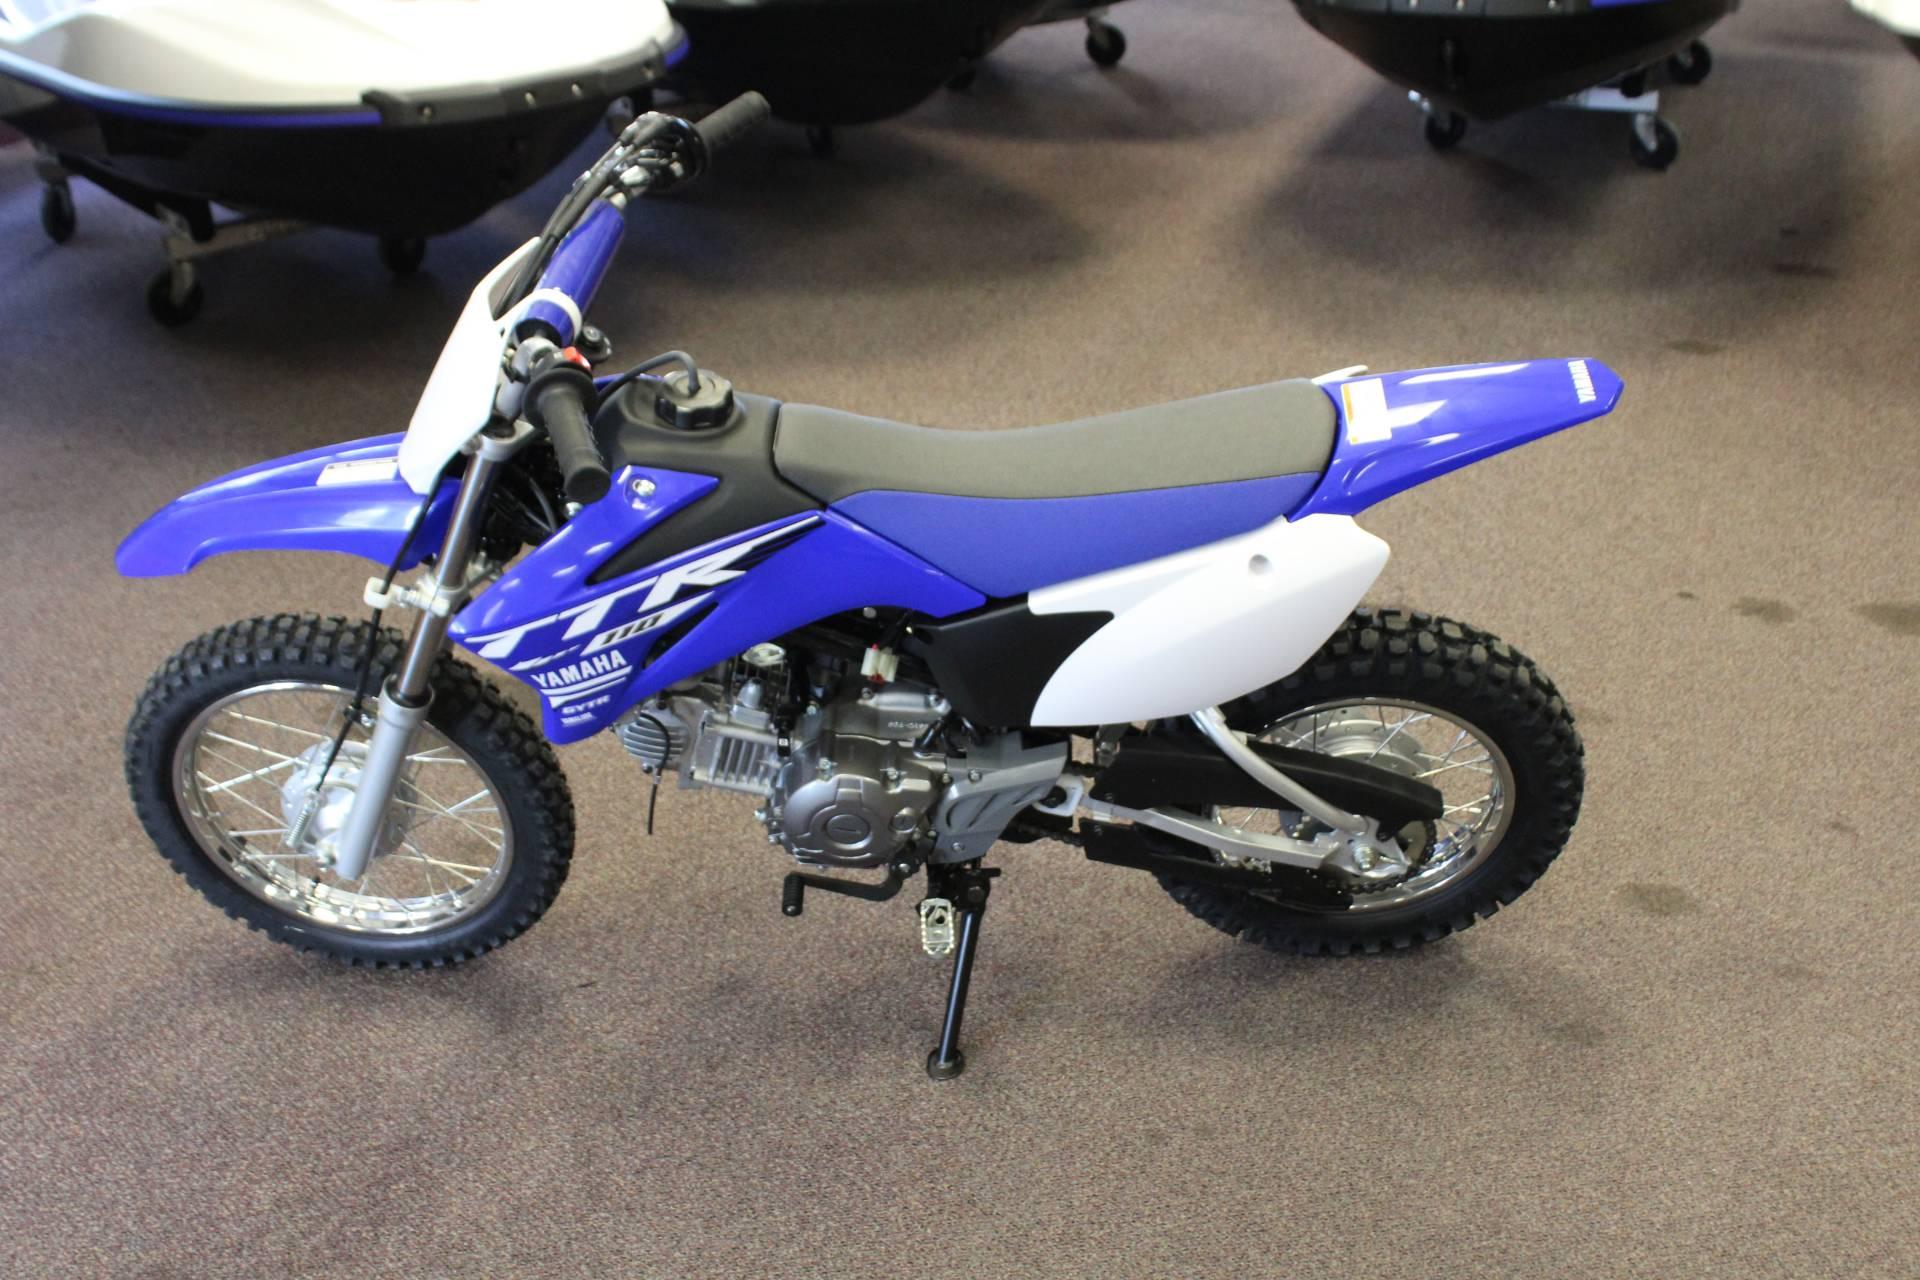 2018 yamaha tt r110e motorcycles palatka florida n a for Yamaha tt r110e